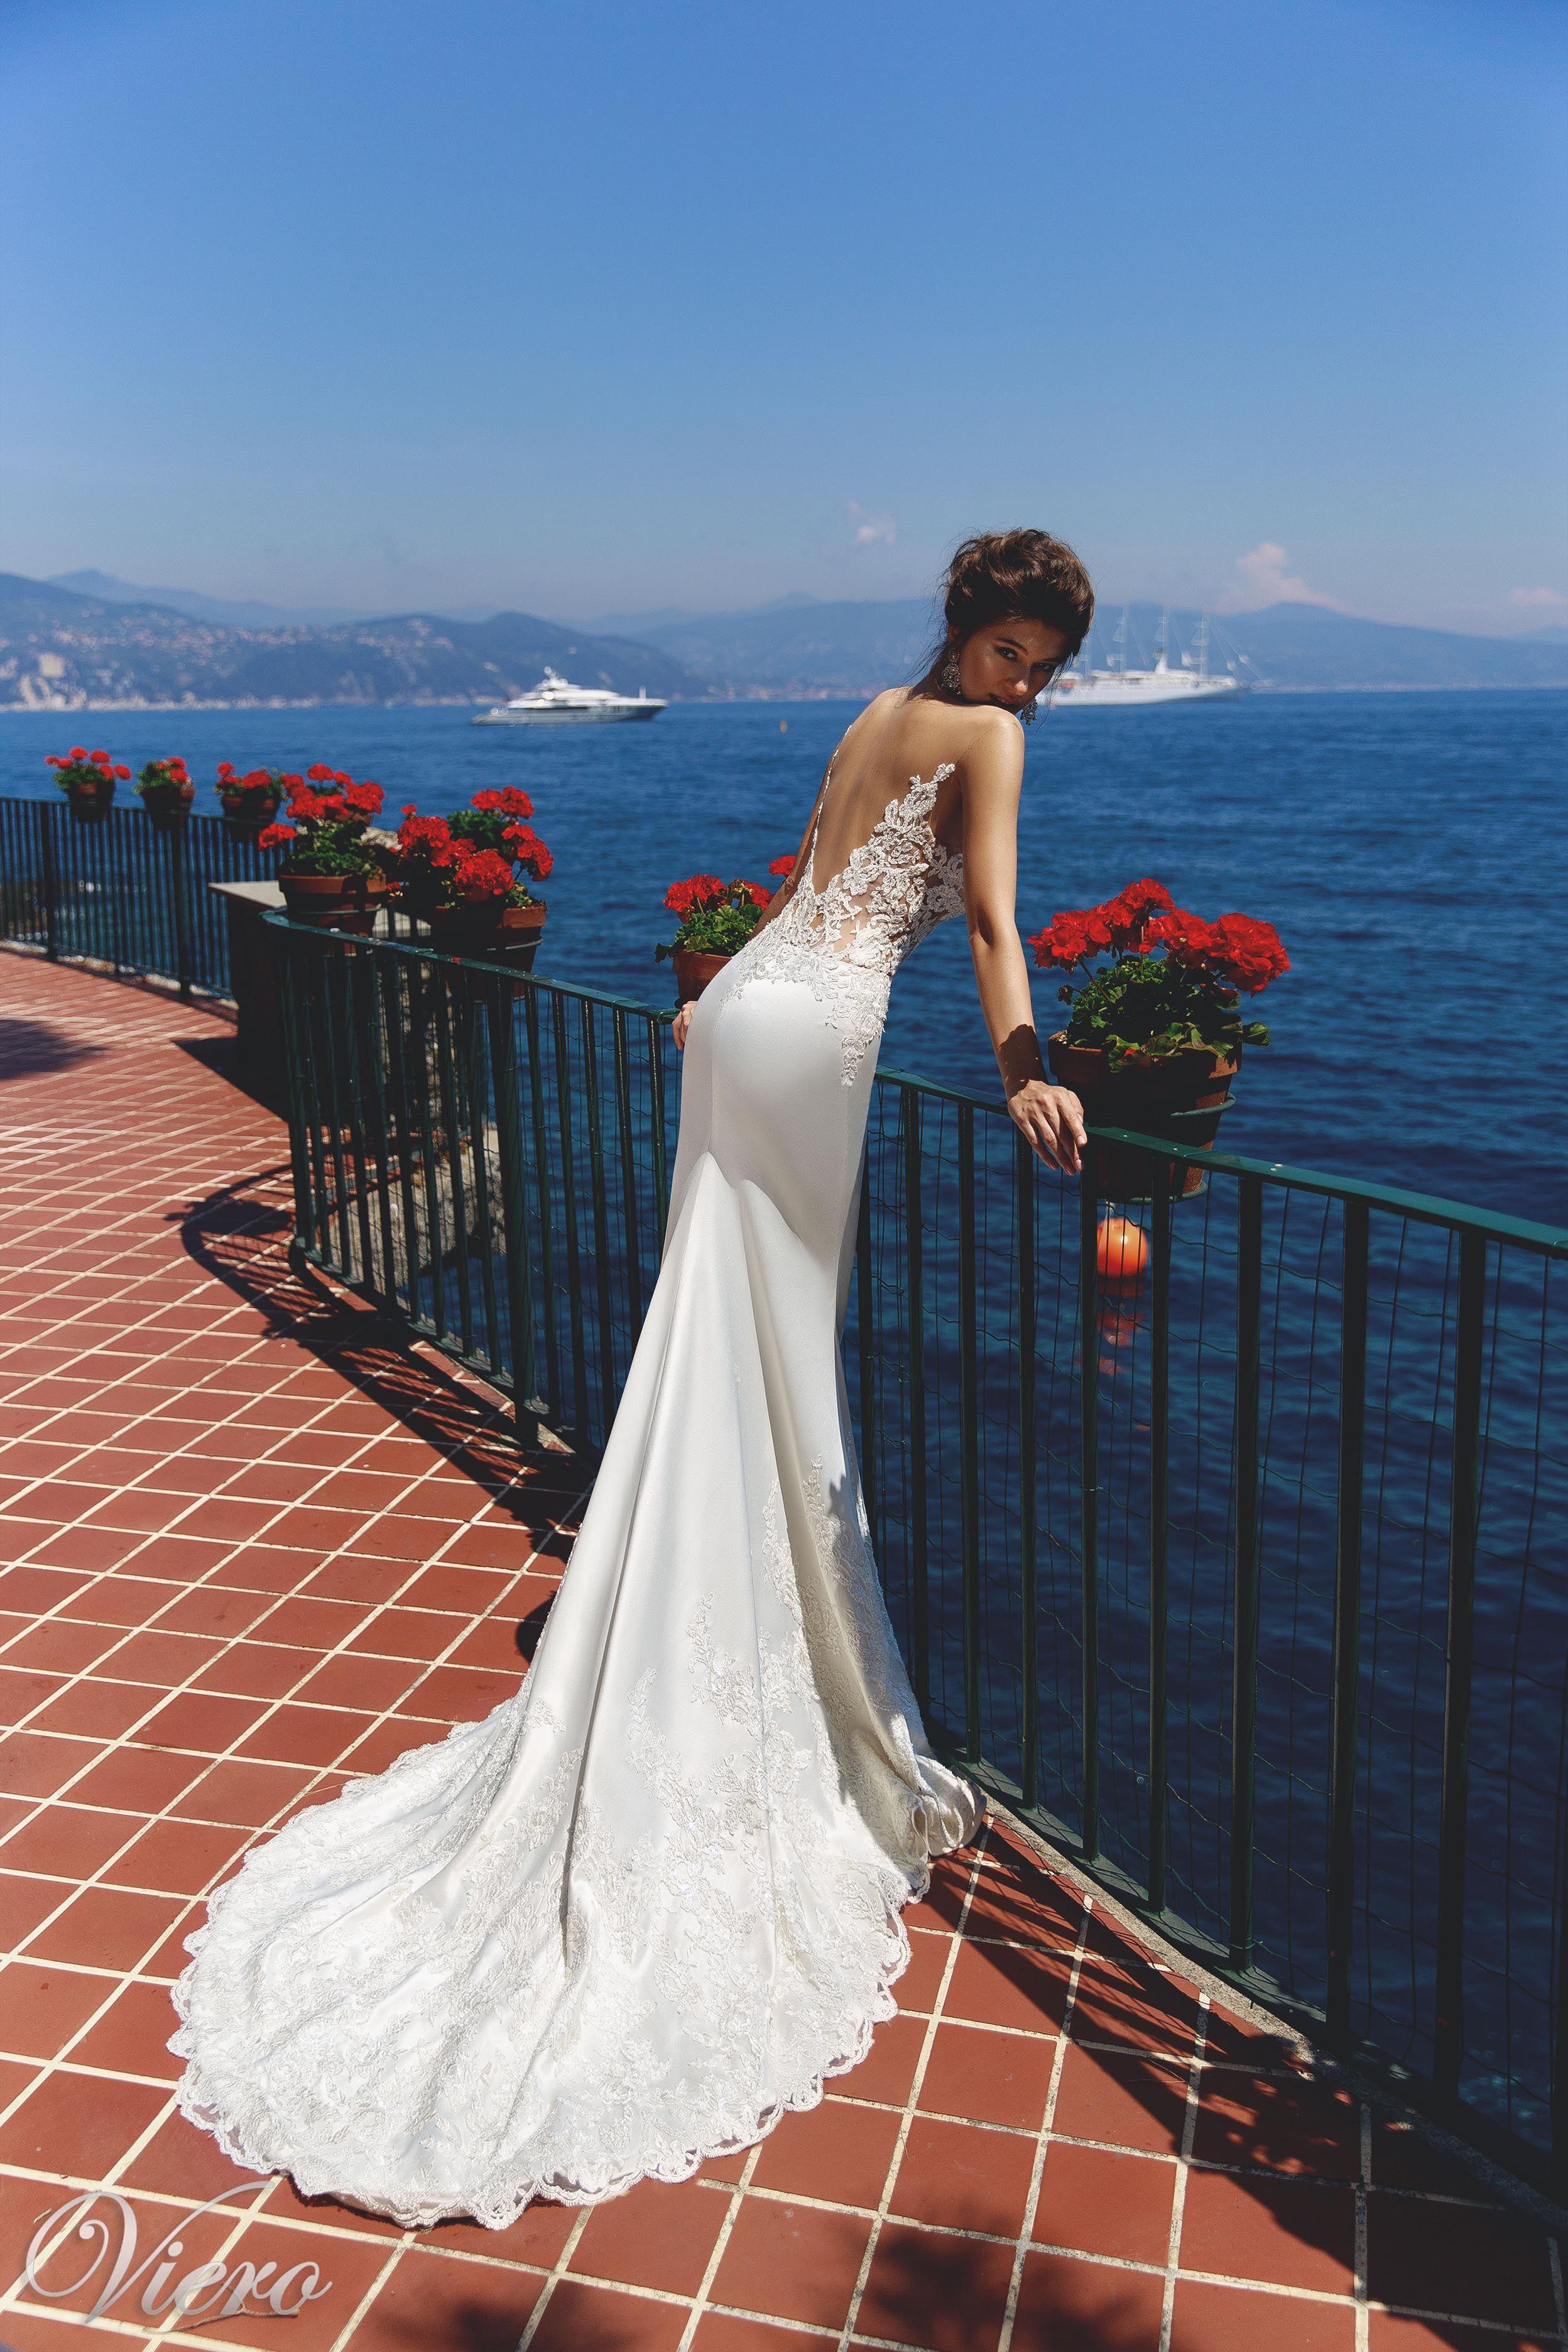 Joelle viero bridal couture wedding dresses wedding dresses lace